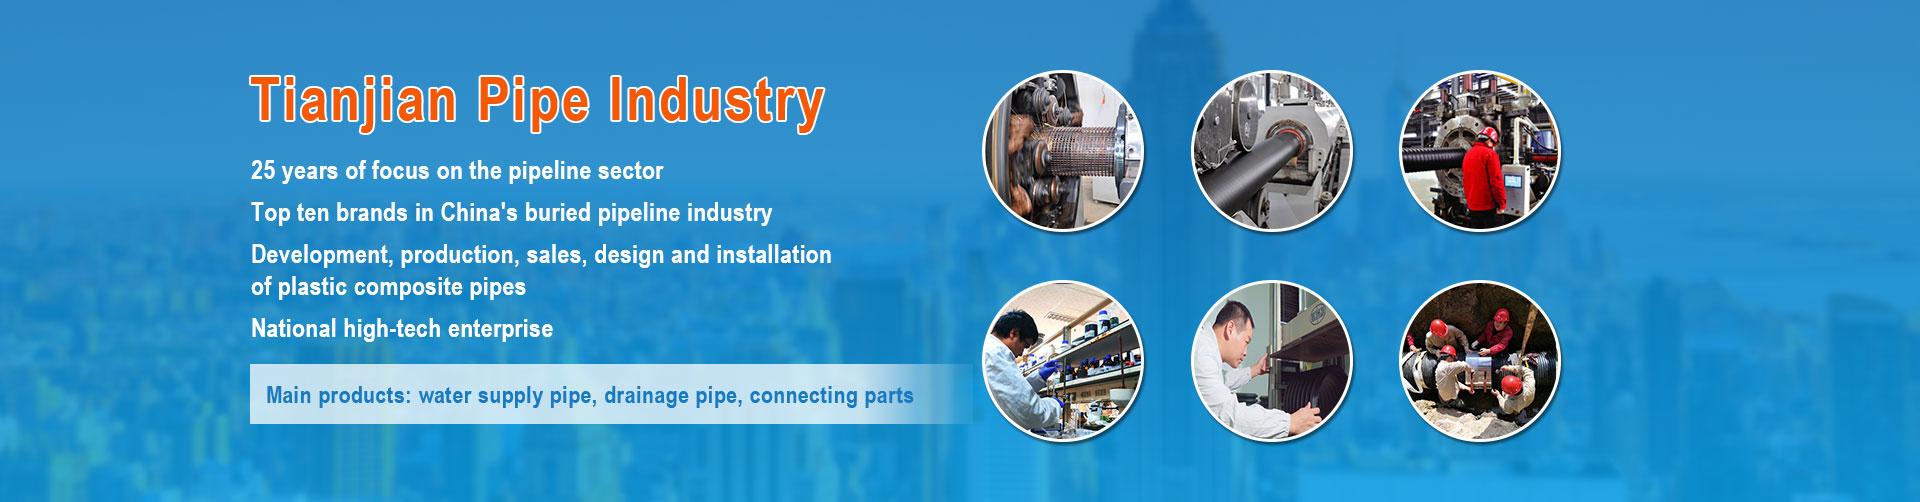 Hubei steel-plastic composite pipe